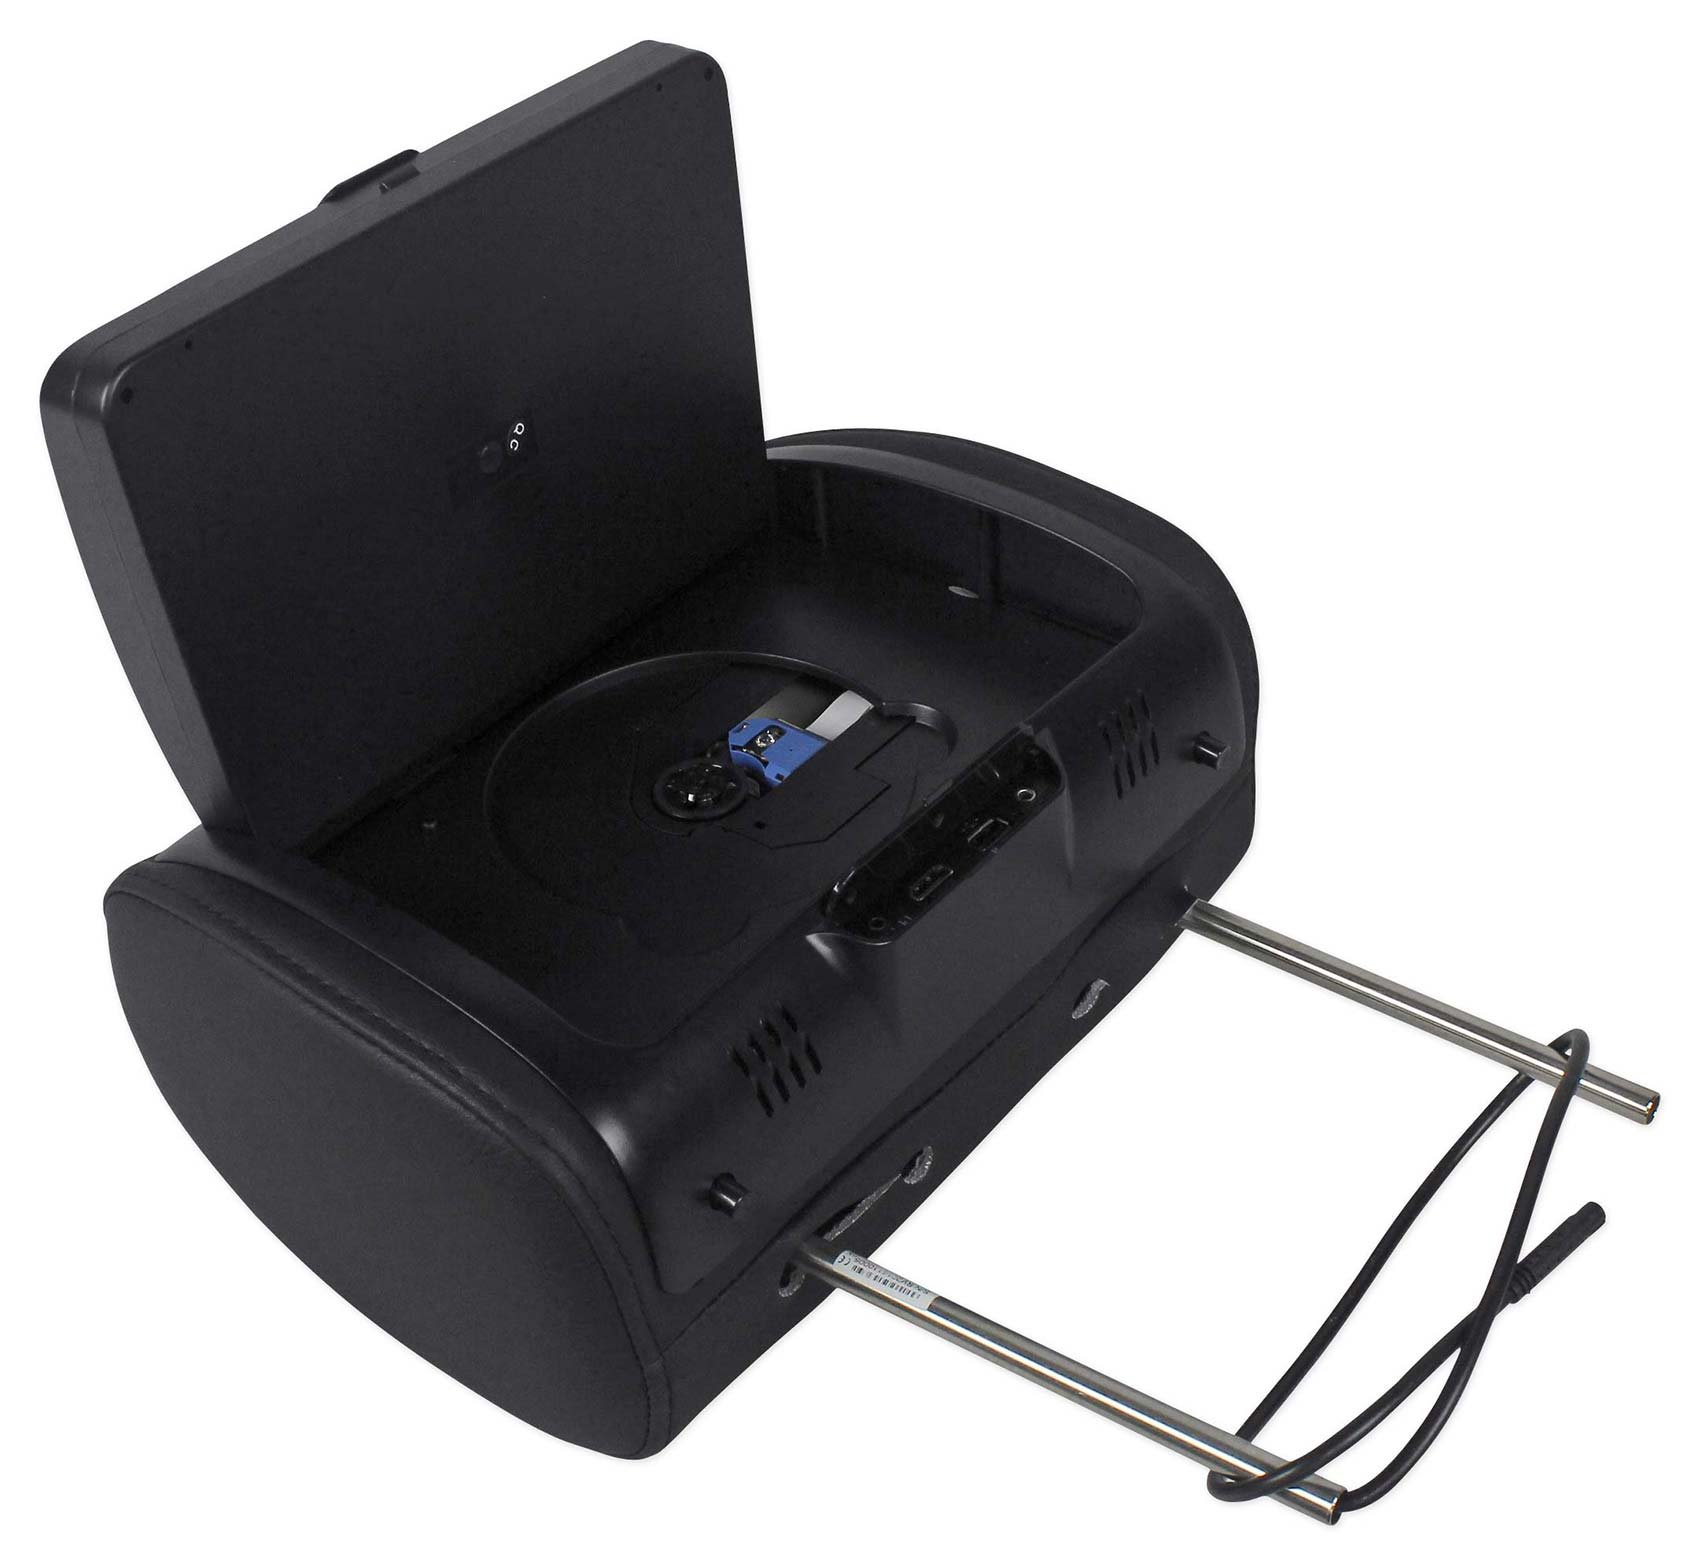 "Rockville RTSVD961-BK 9"" Black Touchscreen Dual DVD/HDMI Car Headrest Monitors by Rockville (Image #4)"